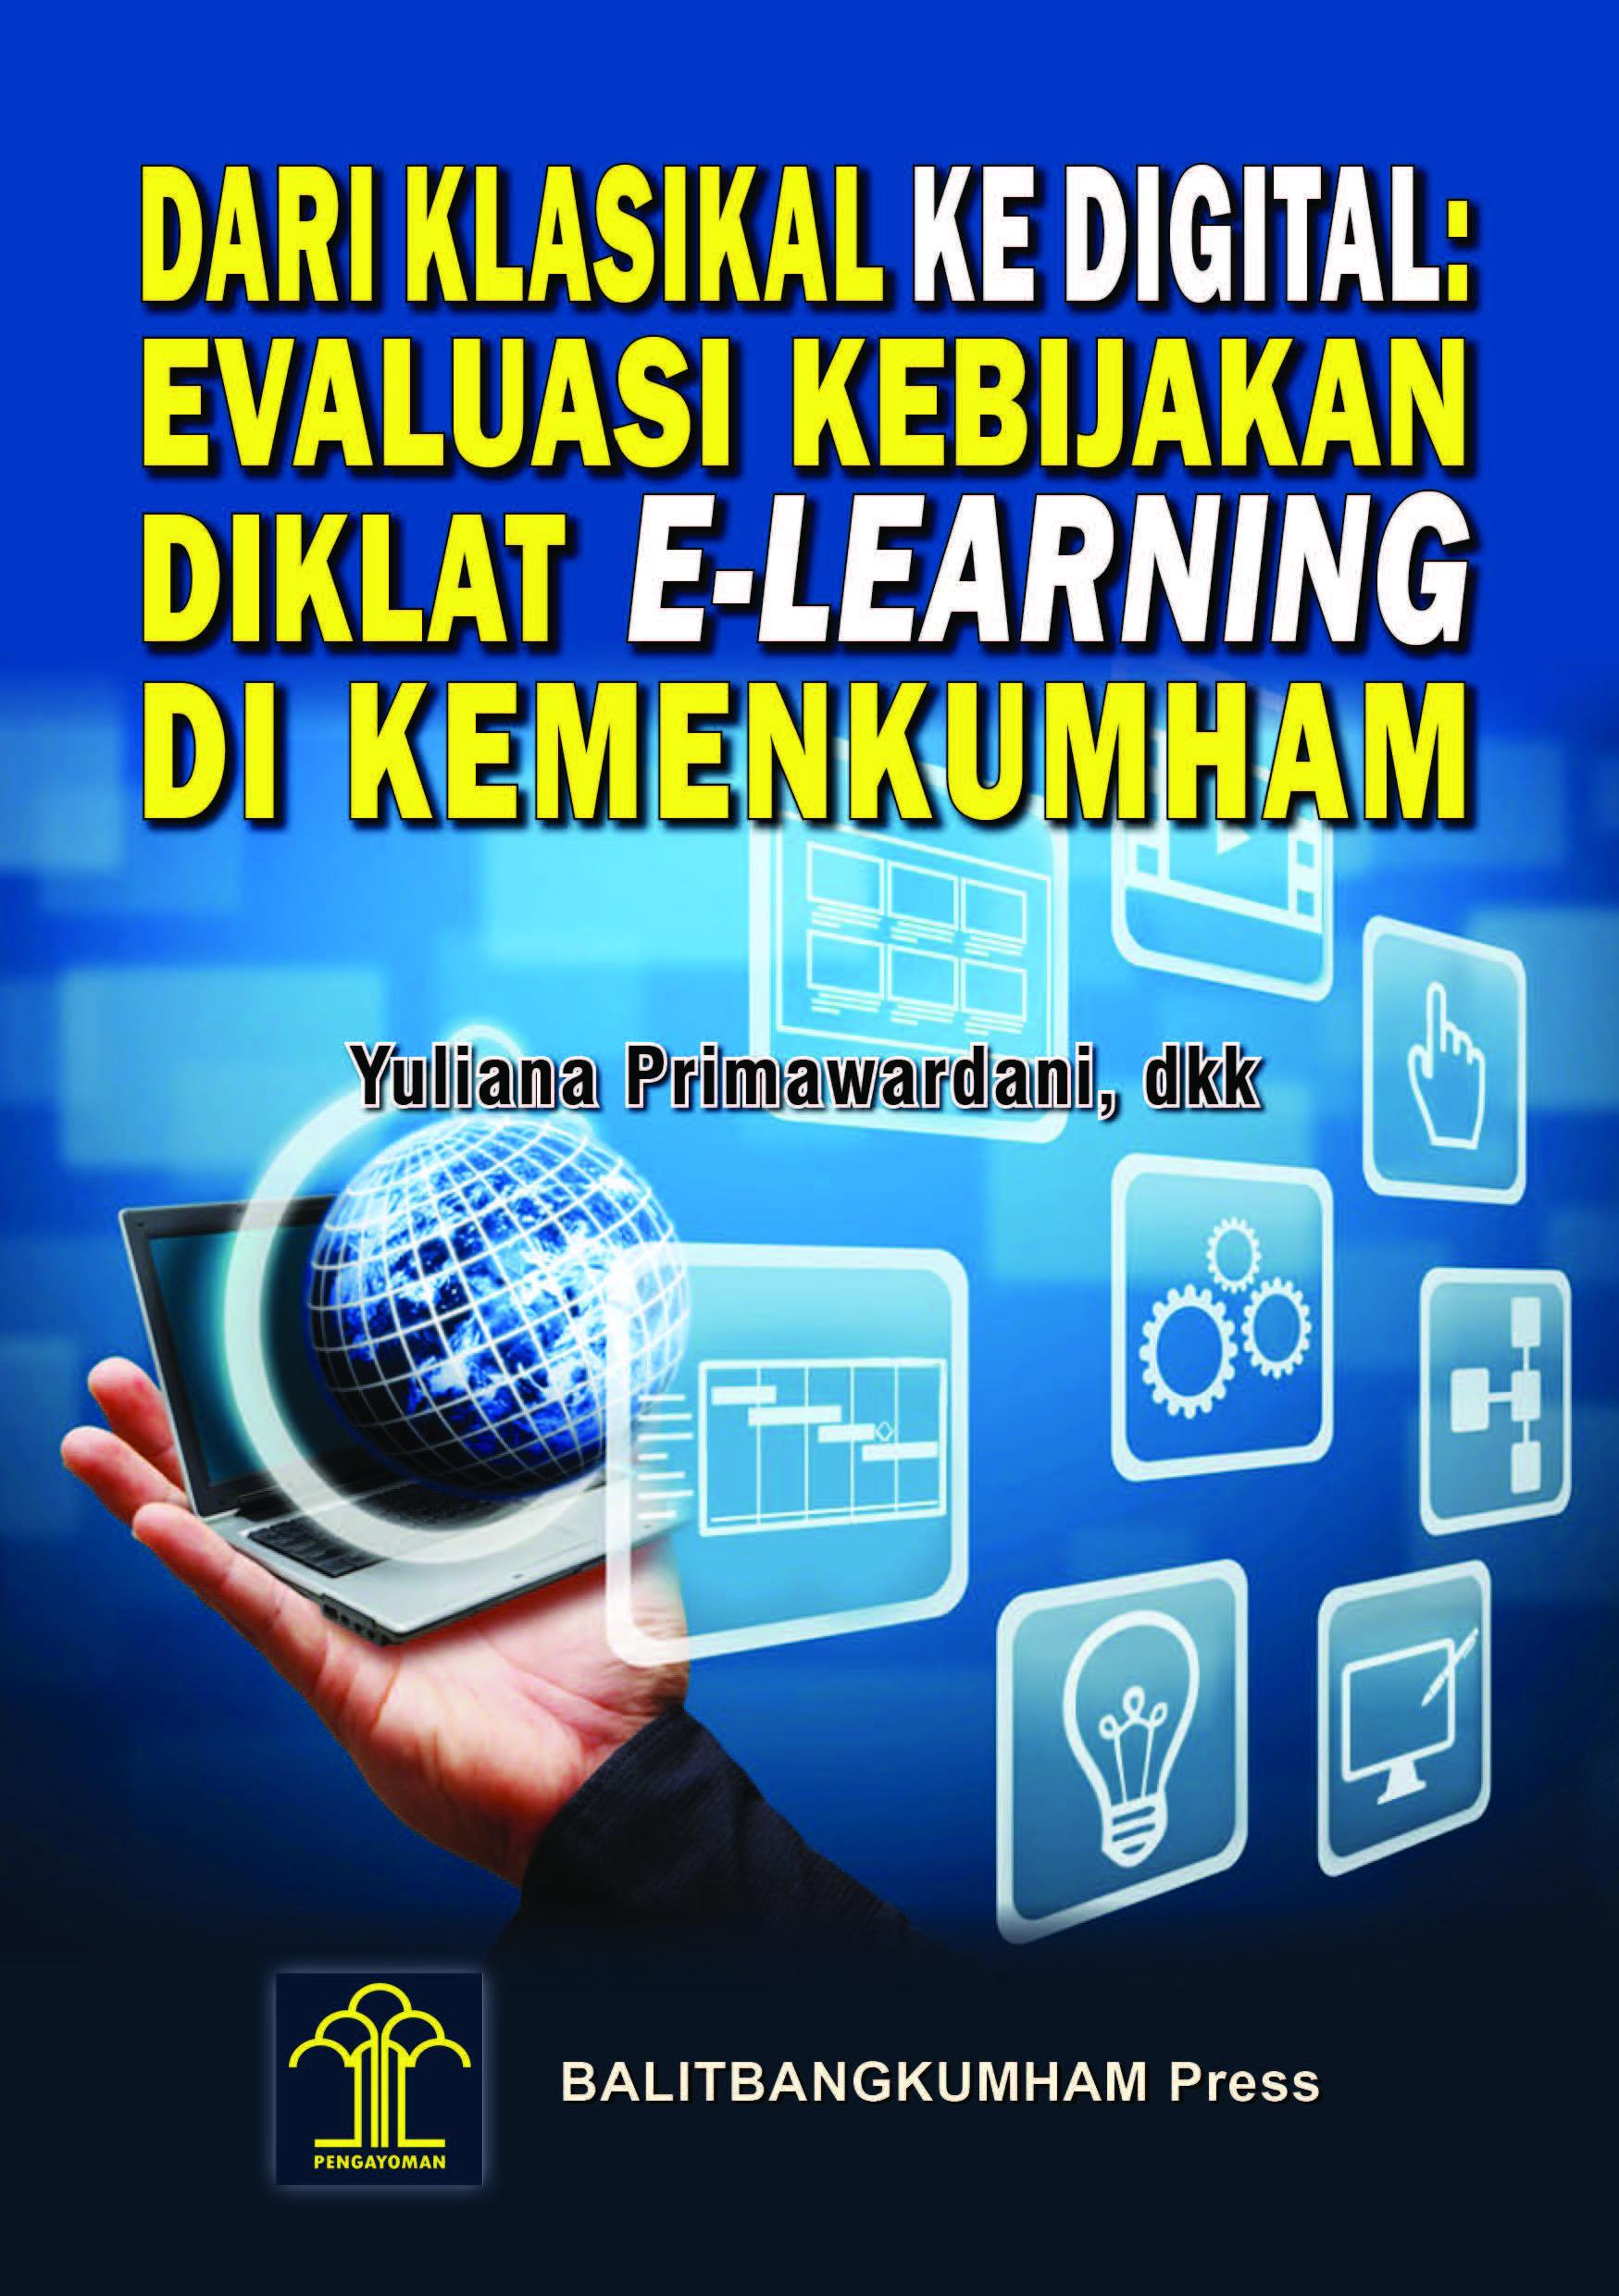 DARI KLASIKAL KE DIGITA EVALUASI KEBIJAKADIKLAT E-LEARNING DI KEMENKUMHAM